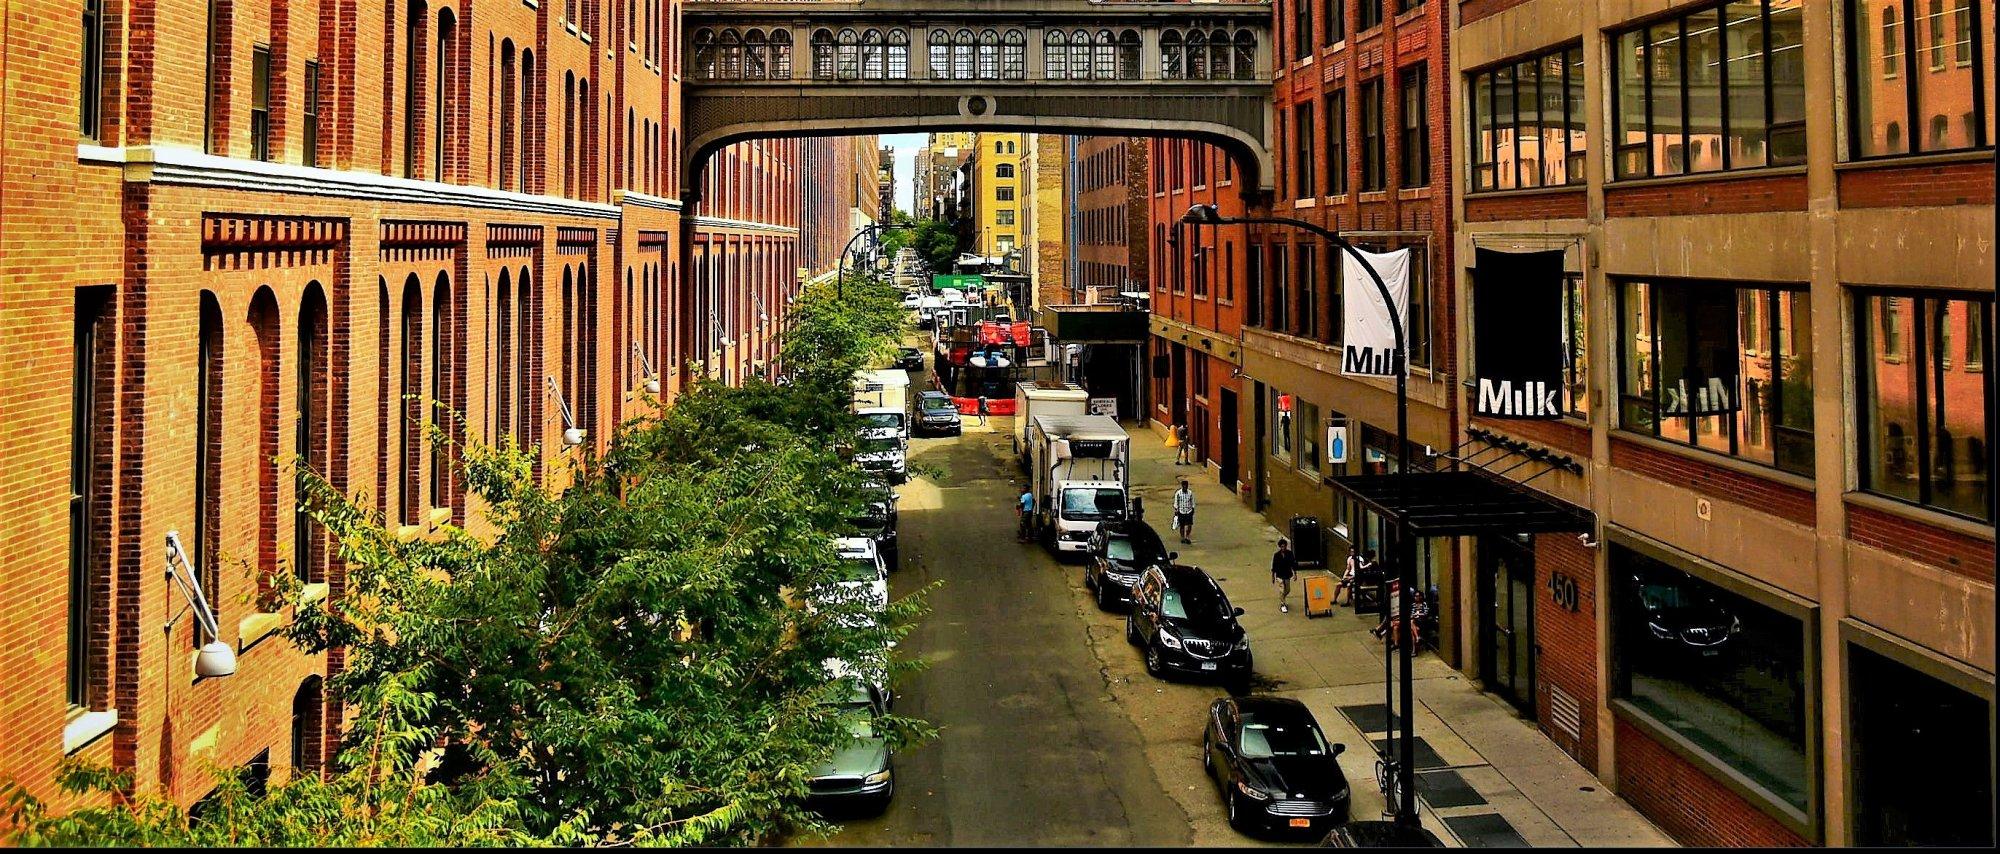 Leafy New York